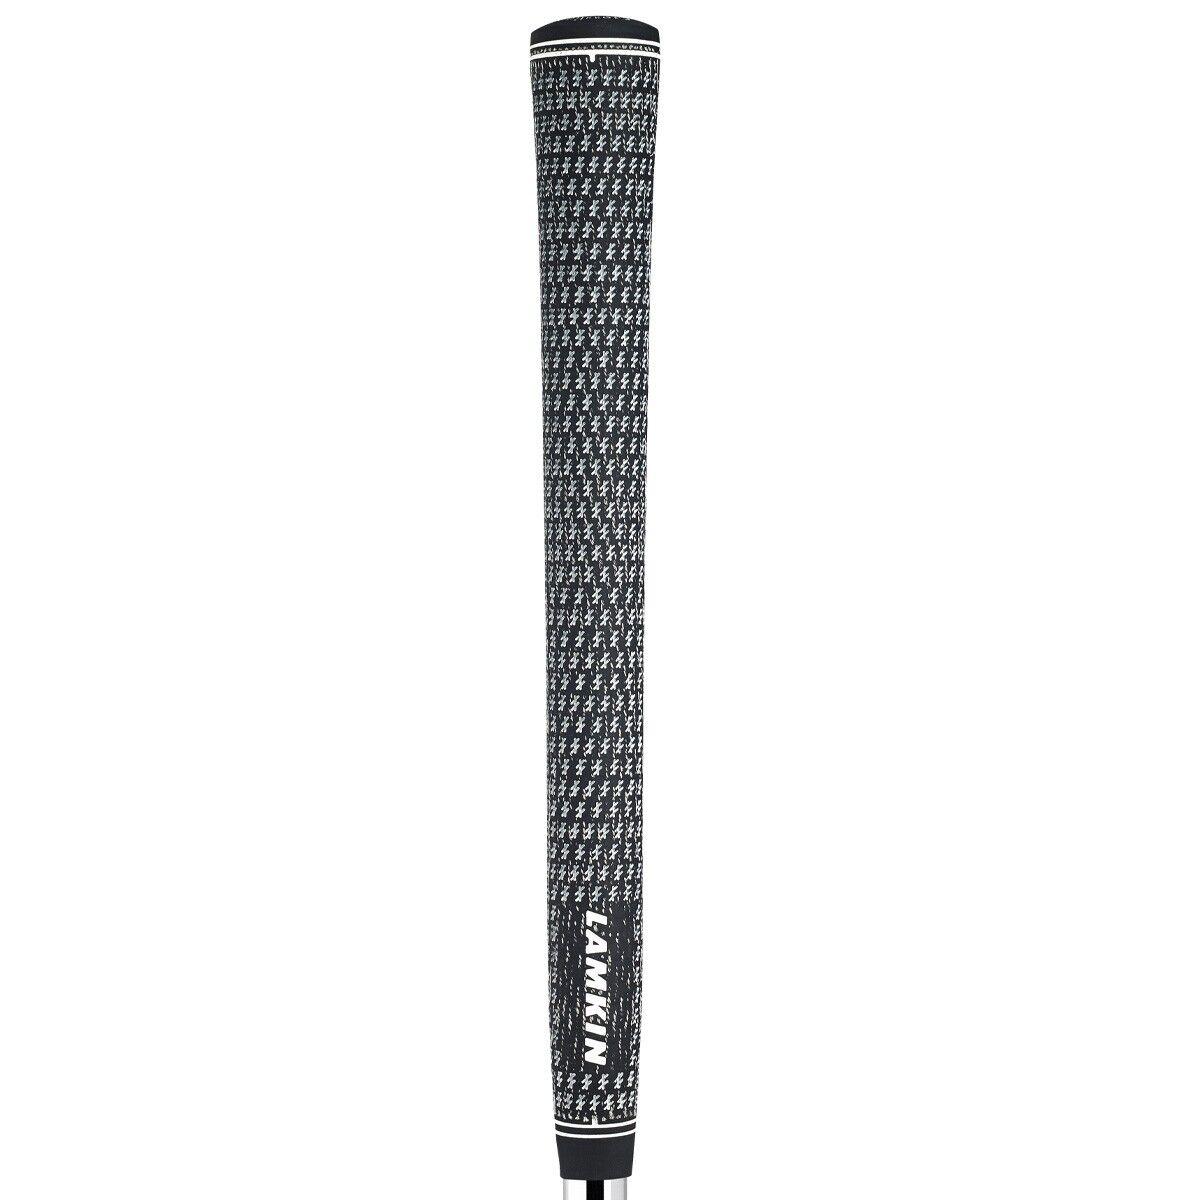 Nuevo logotipo Set De 13 Lamkin Crossline Full Cord Grips. OverTalla agarre sobre tamaño